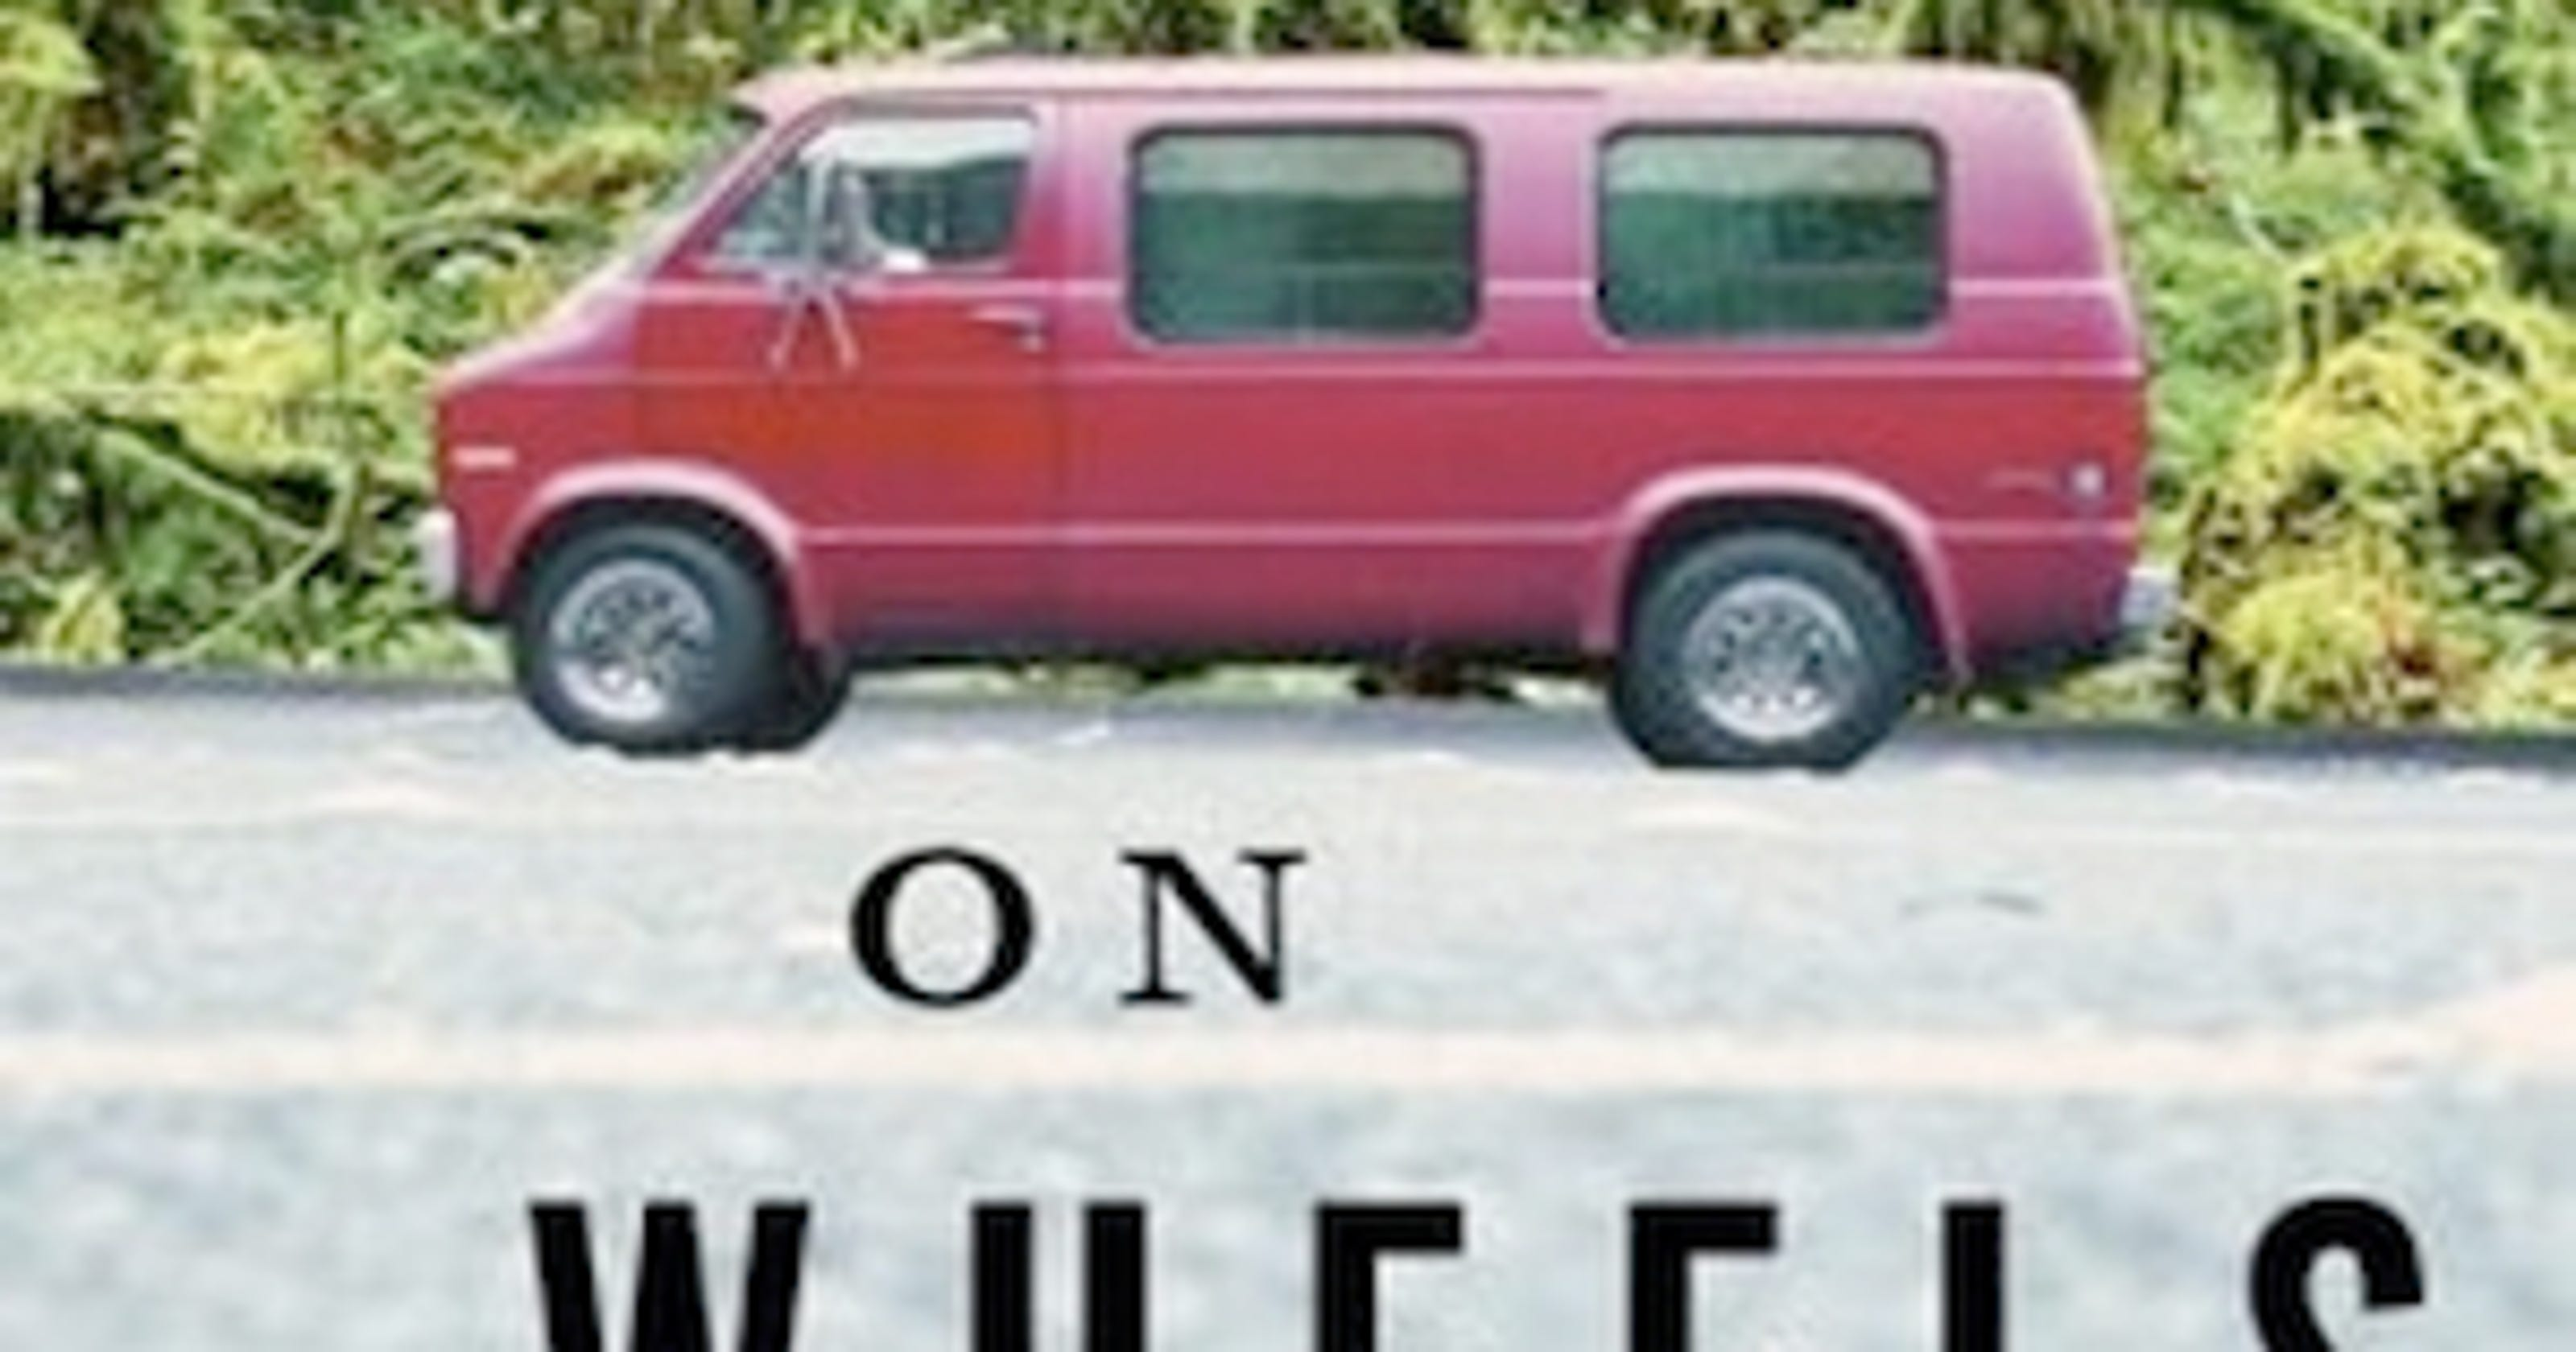 Duke alum writes book about living in van during grad school